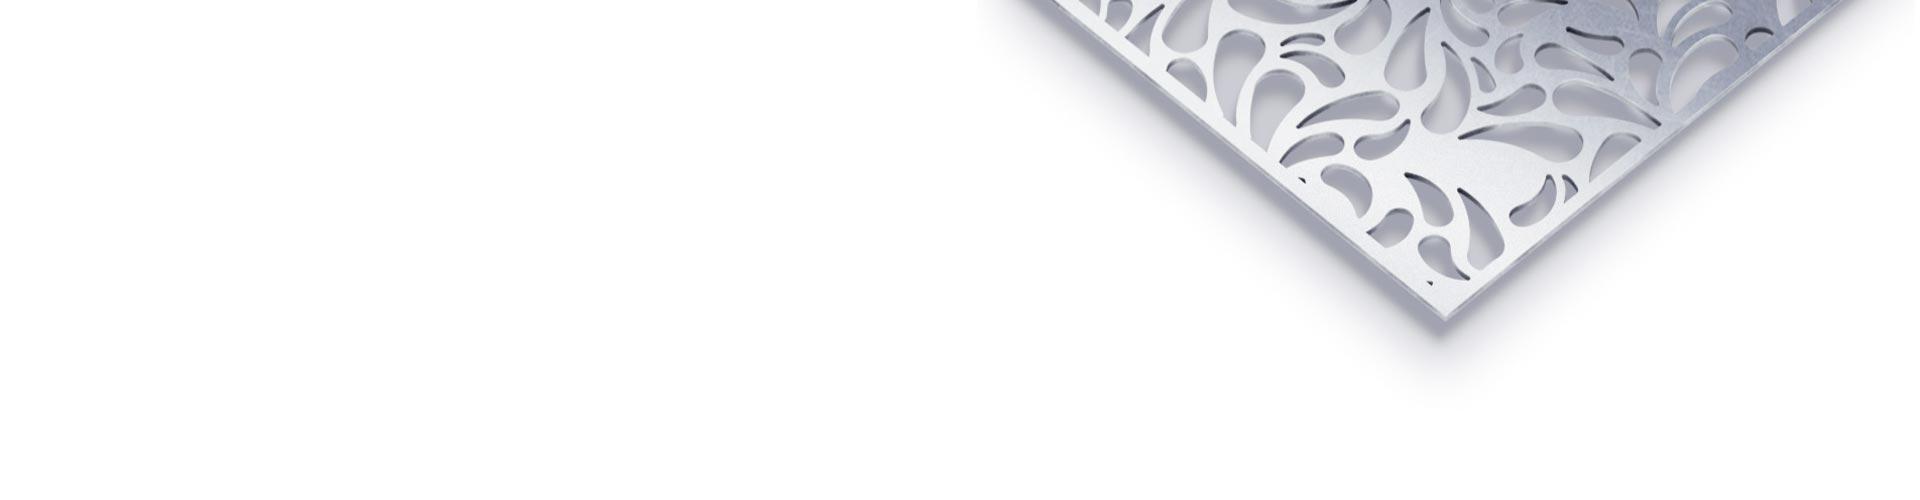 Designbleche mit dekormuster – perfolinea.de